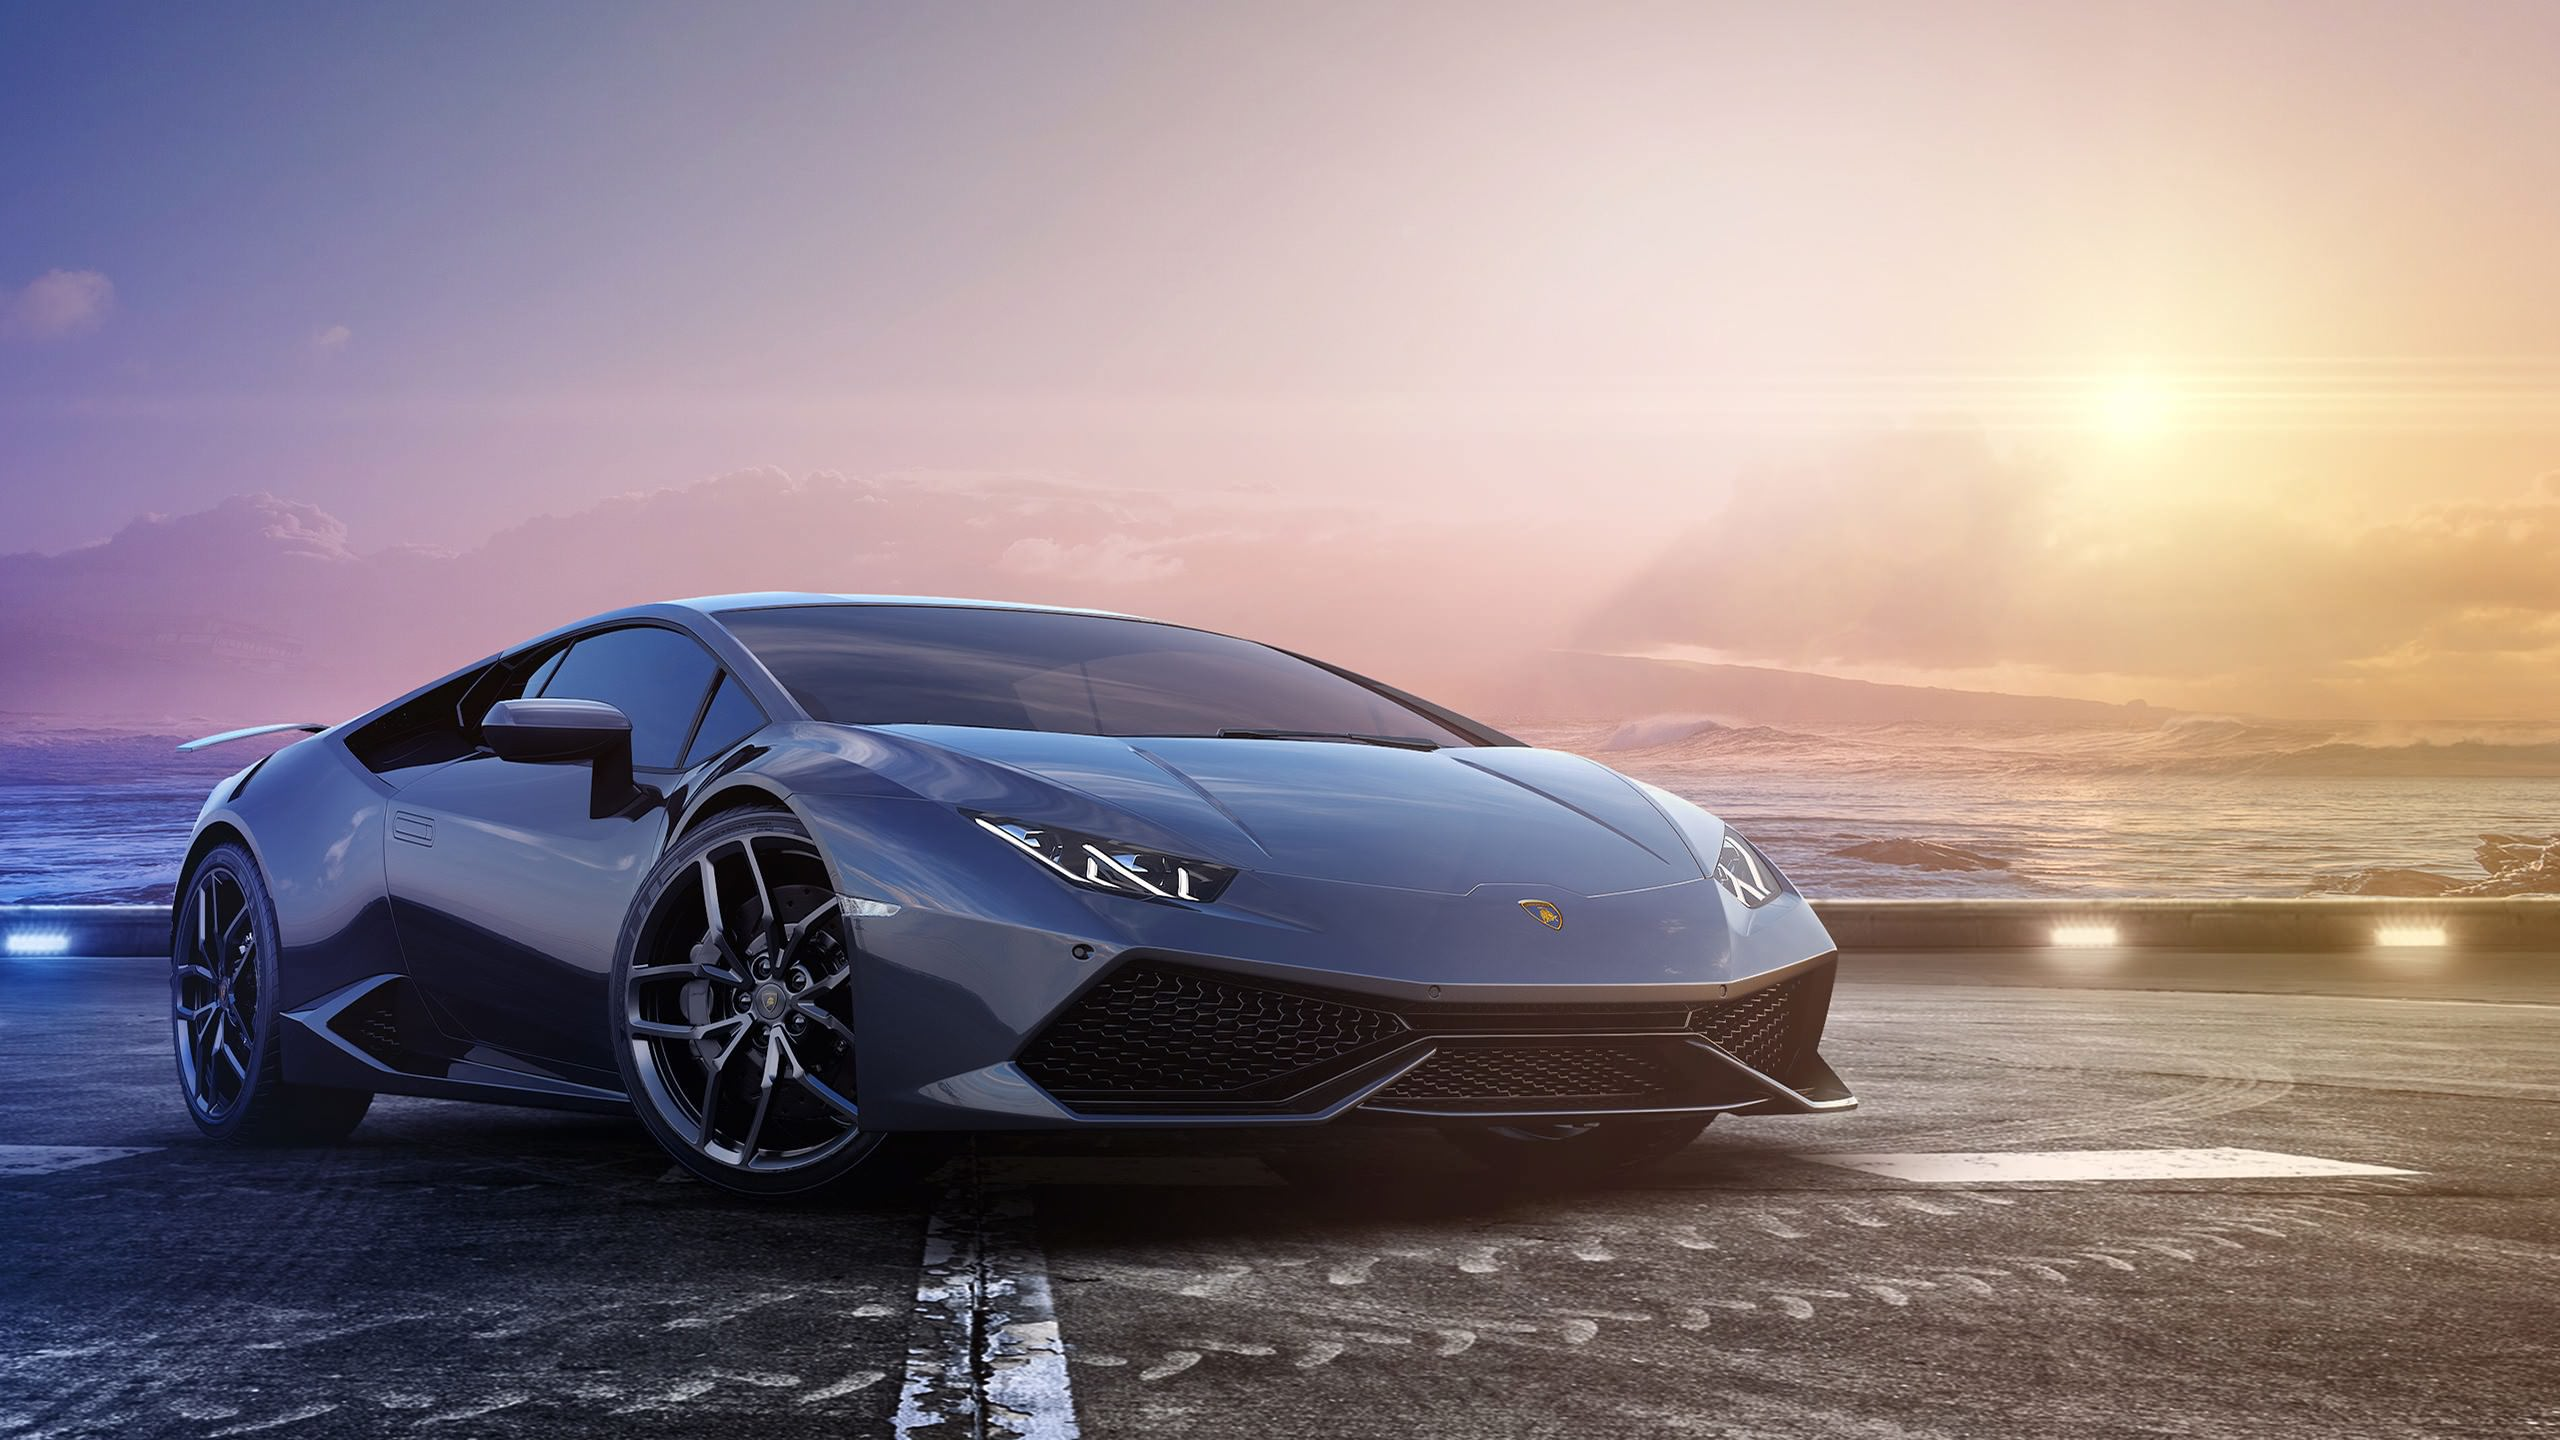 Lamborghini Wallpapers Top Free Lamborghini Backgrounds